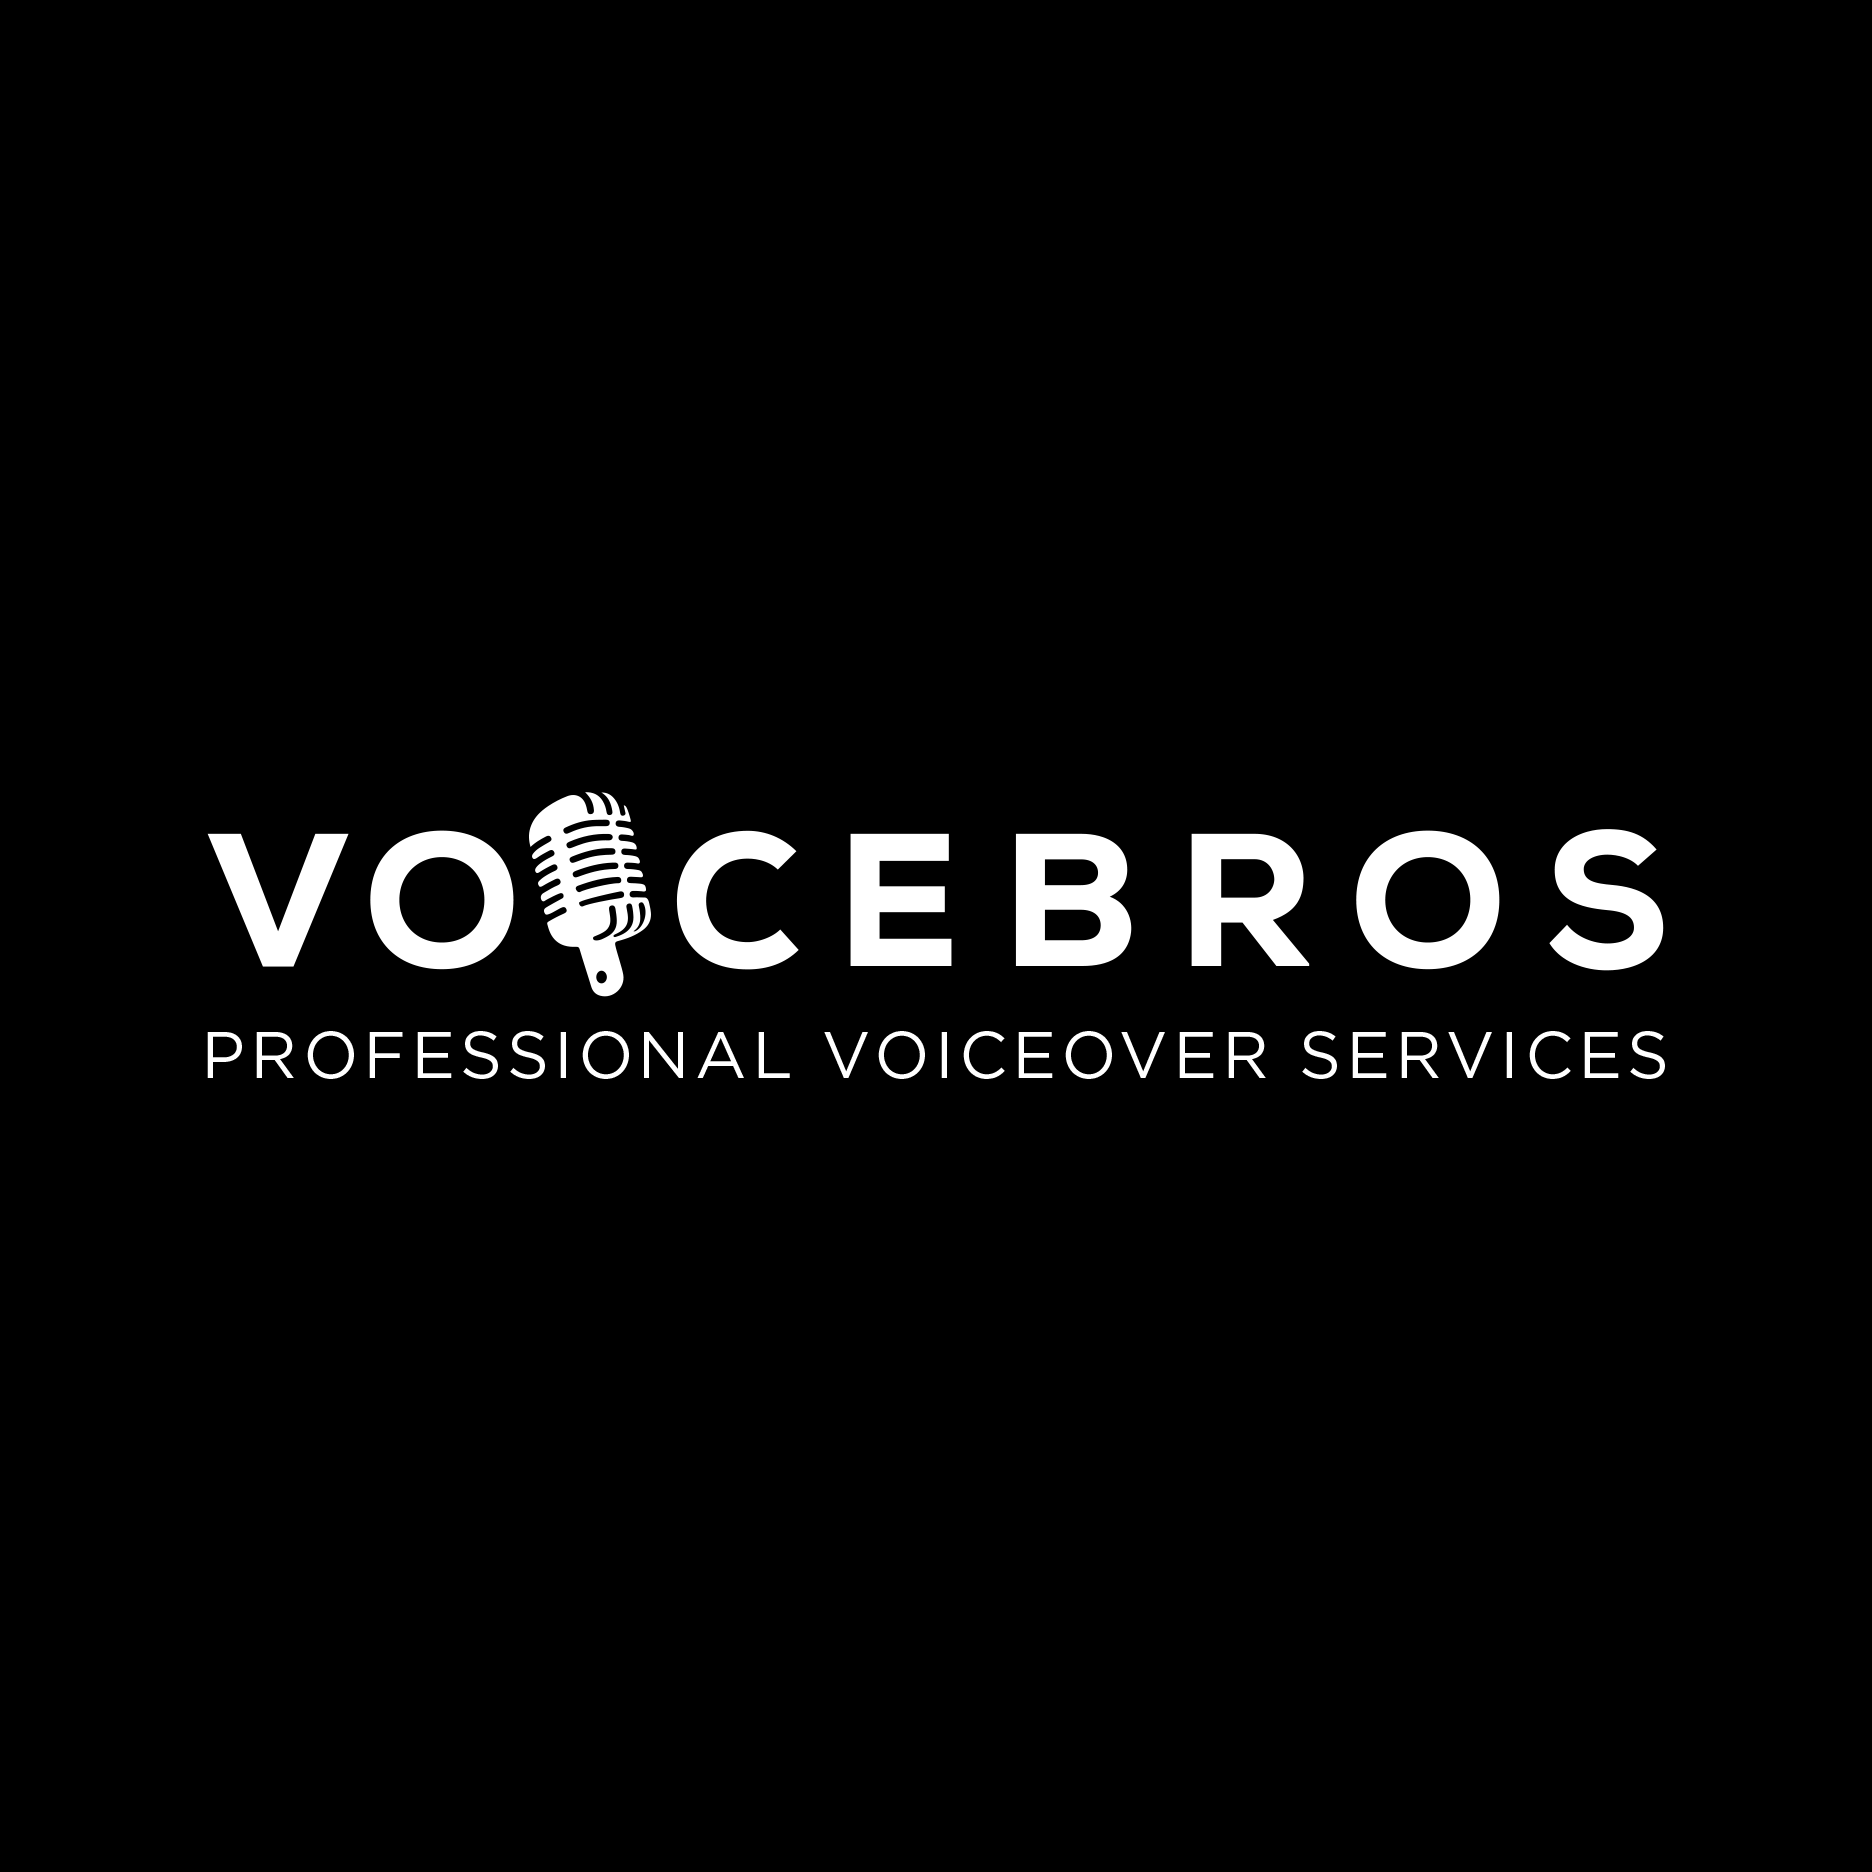 Raquel Vilaplana is a voice over actor